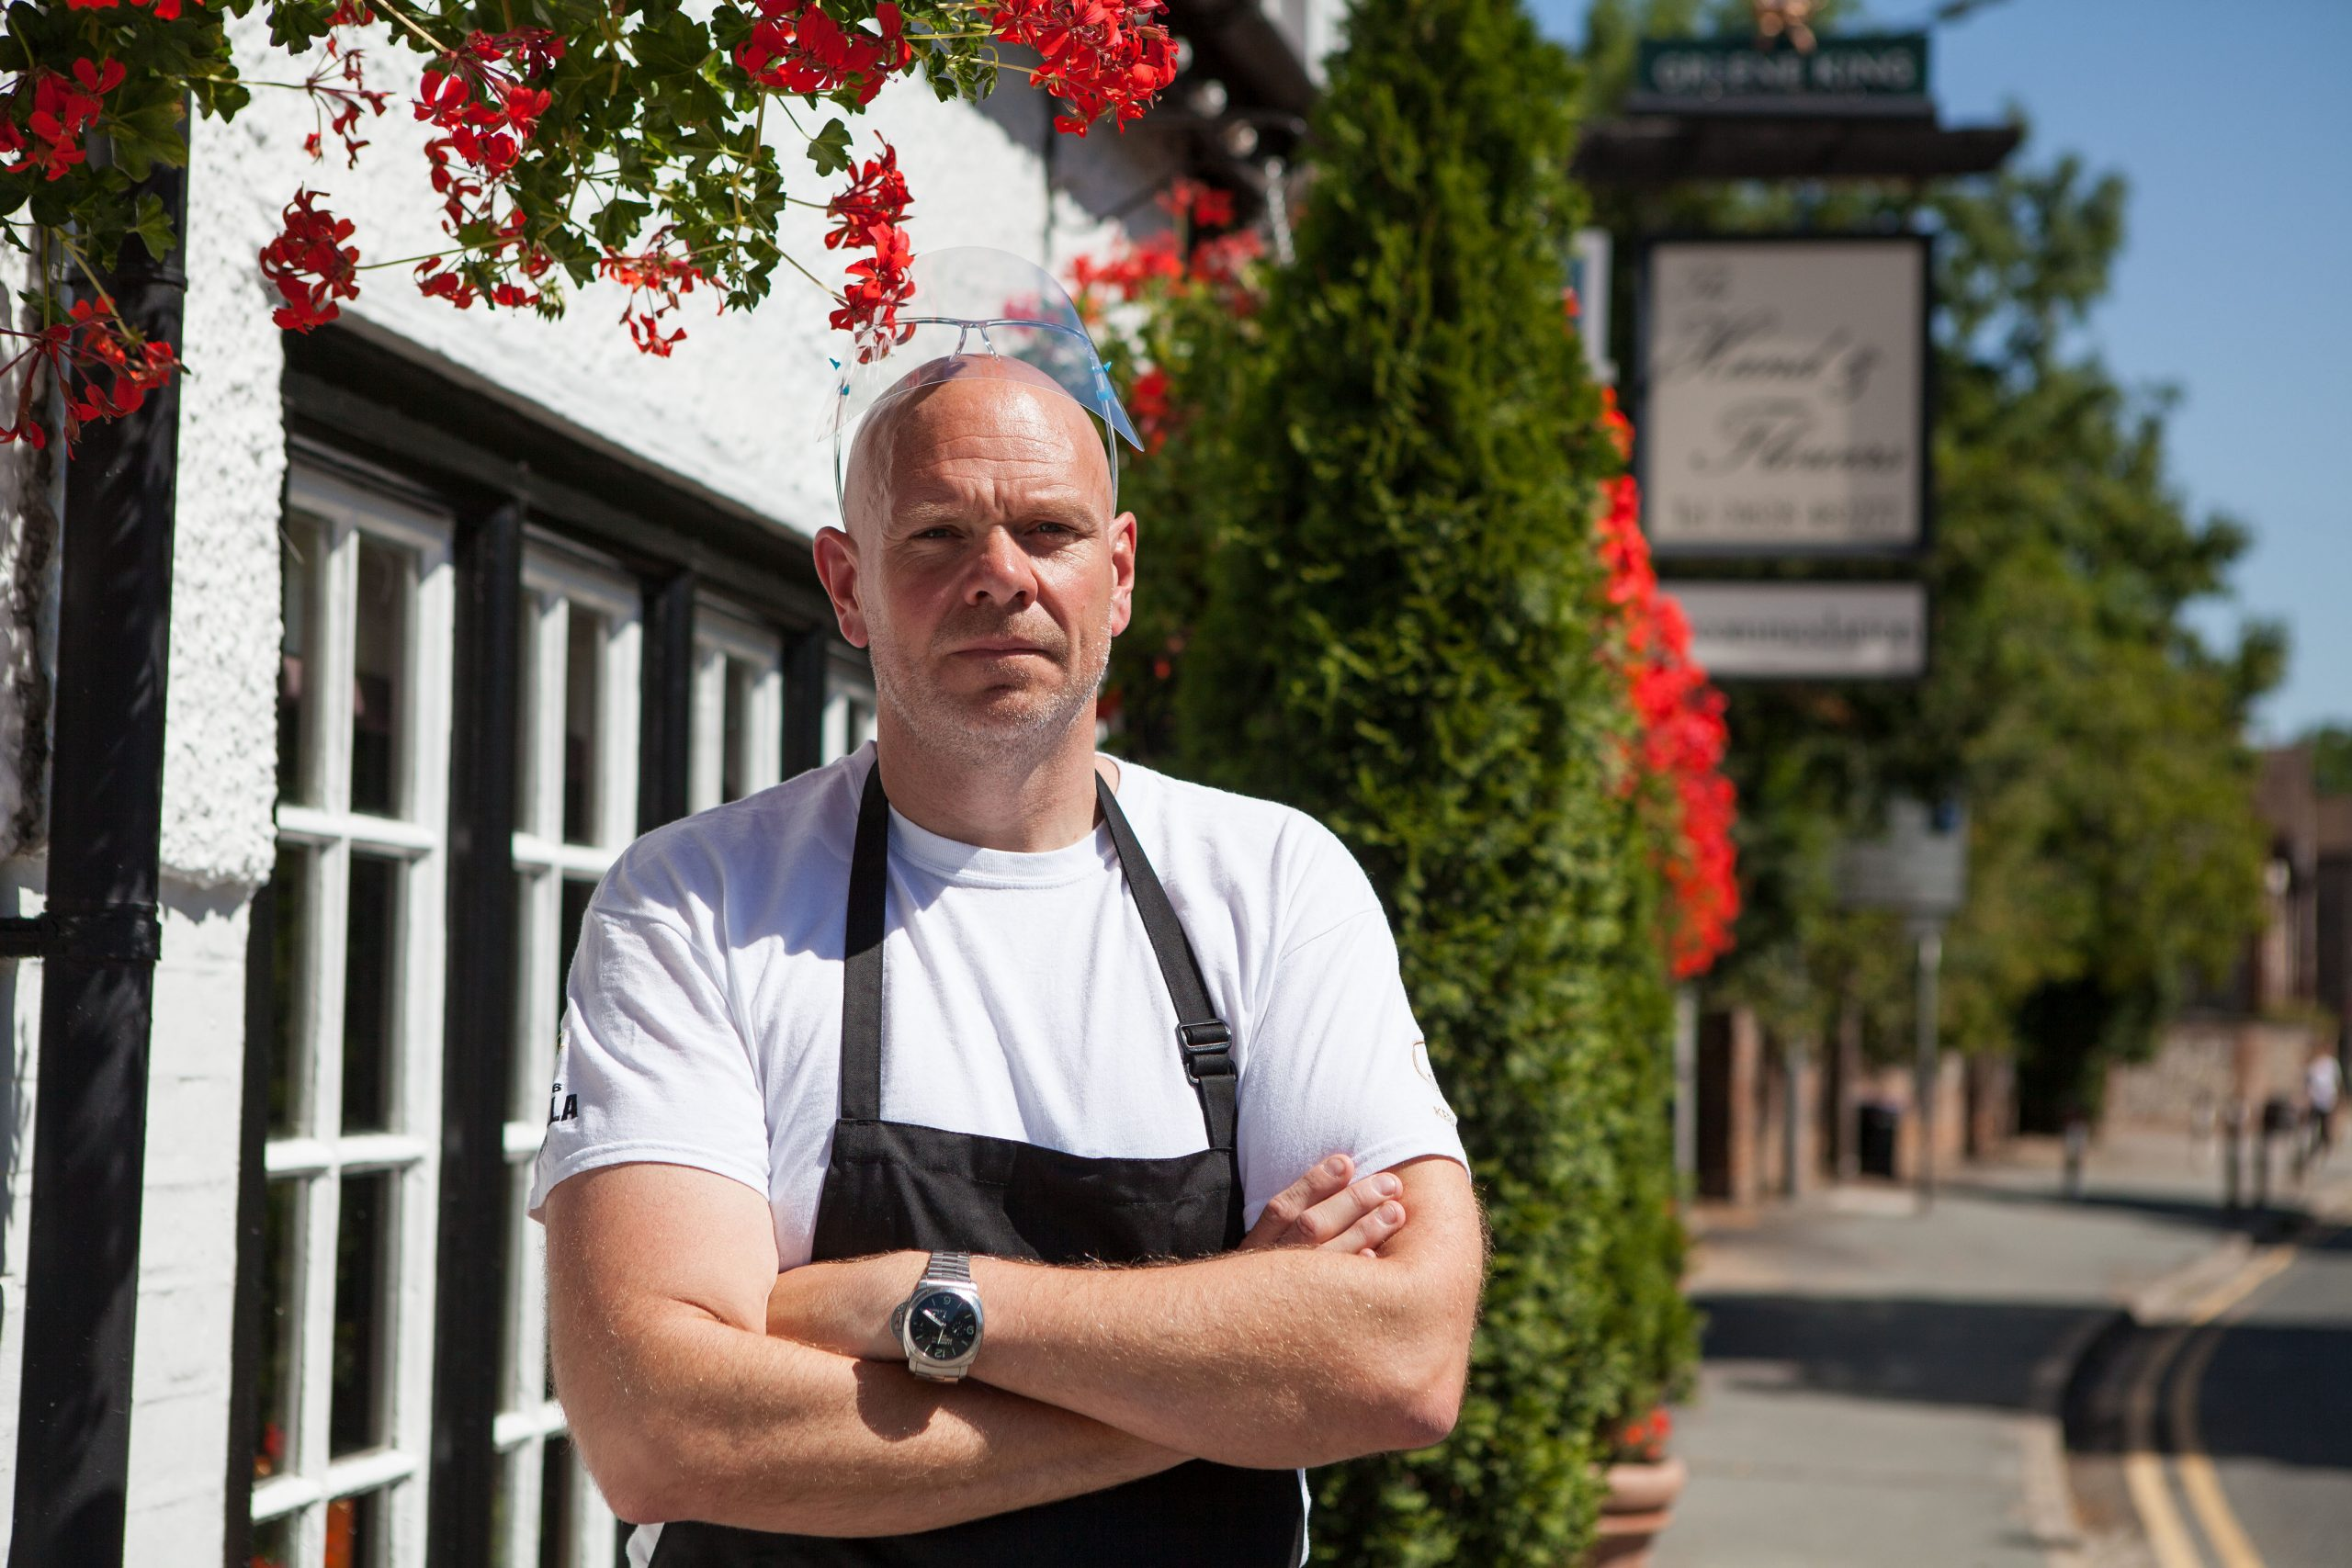 Tom Kerridge usa una visera frente a su propio pub, The Hand and Flowers